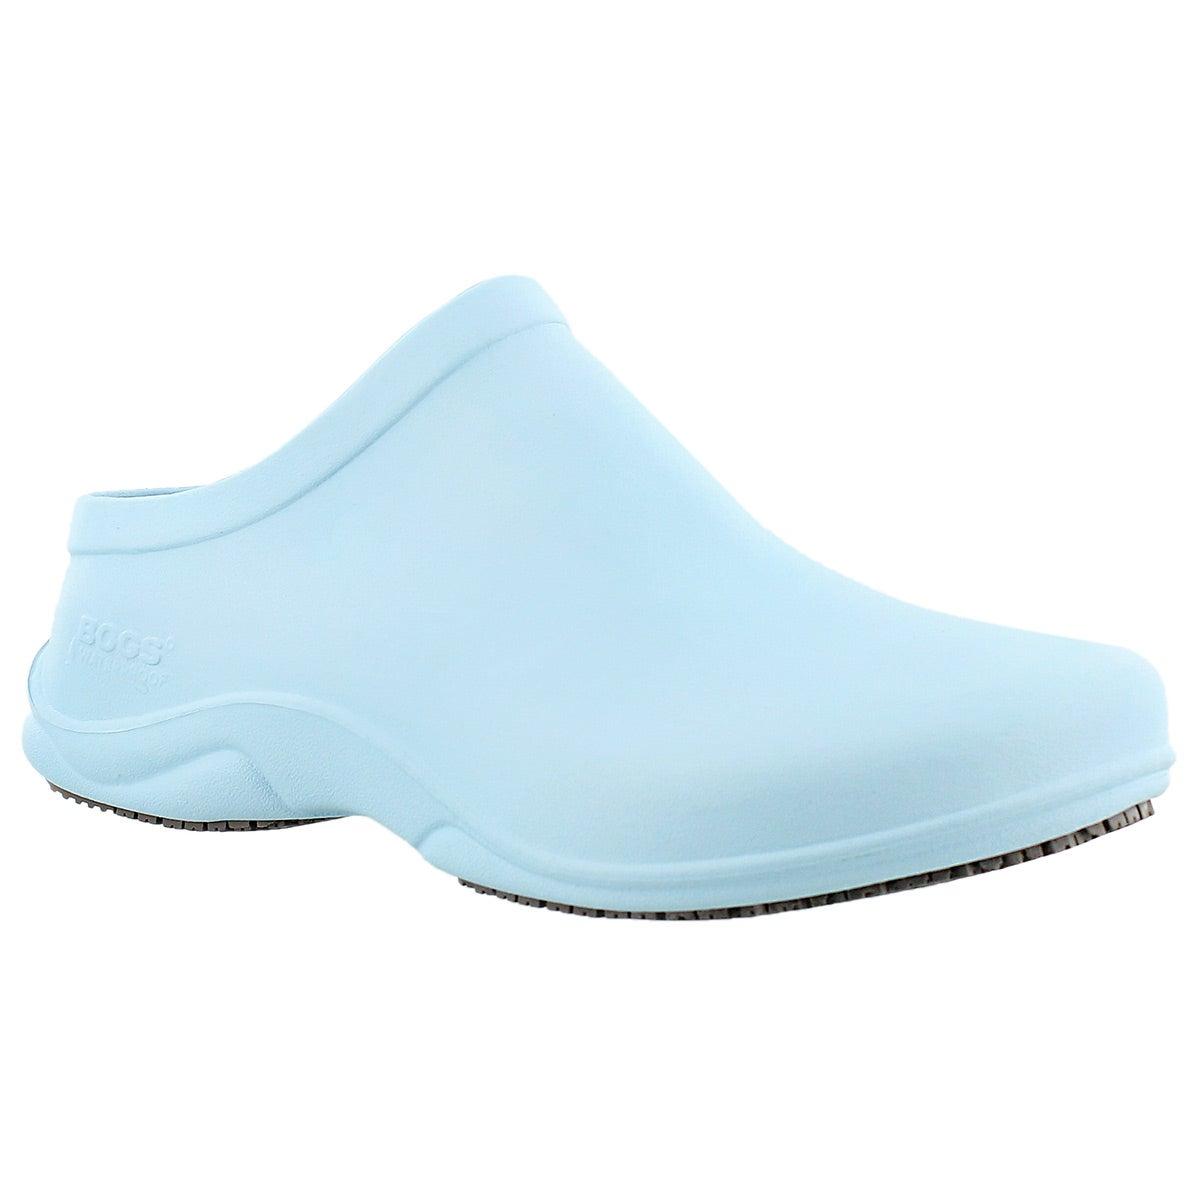 Lds Stewart sky blue wtpf anti-slip clog